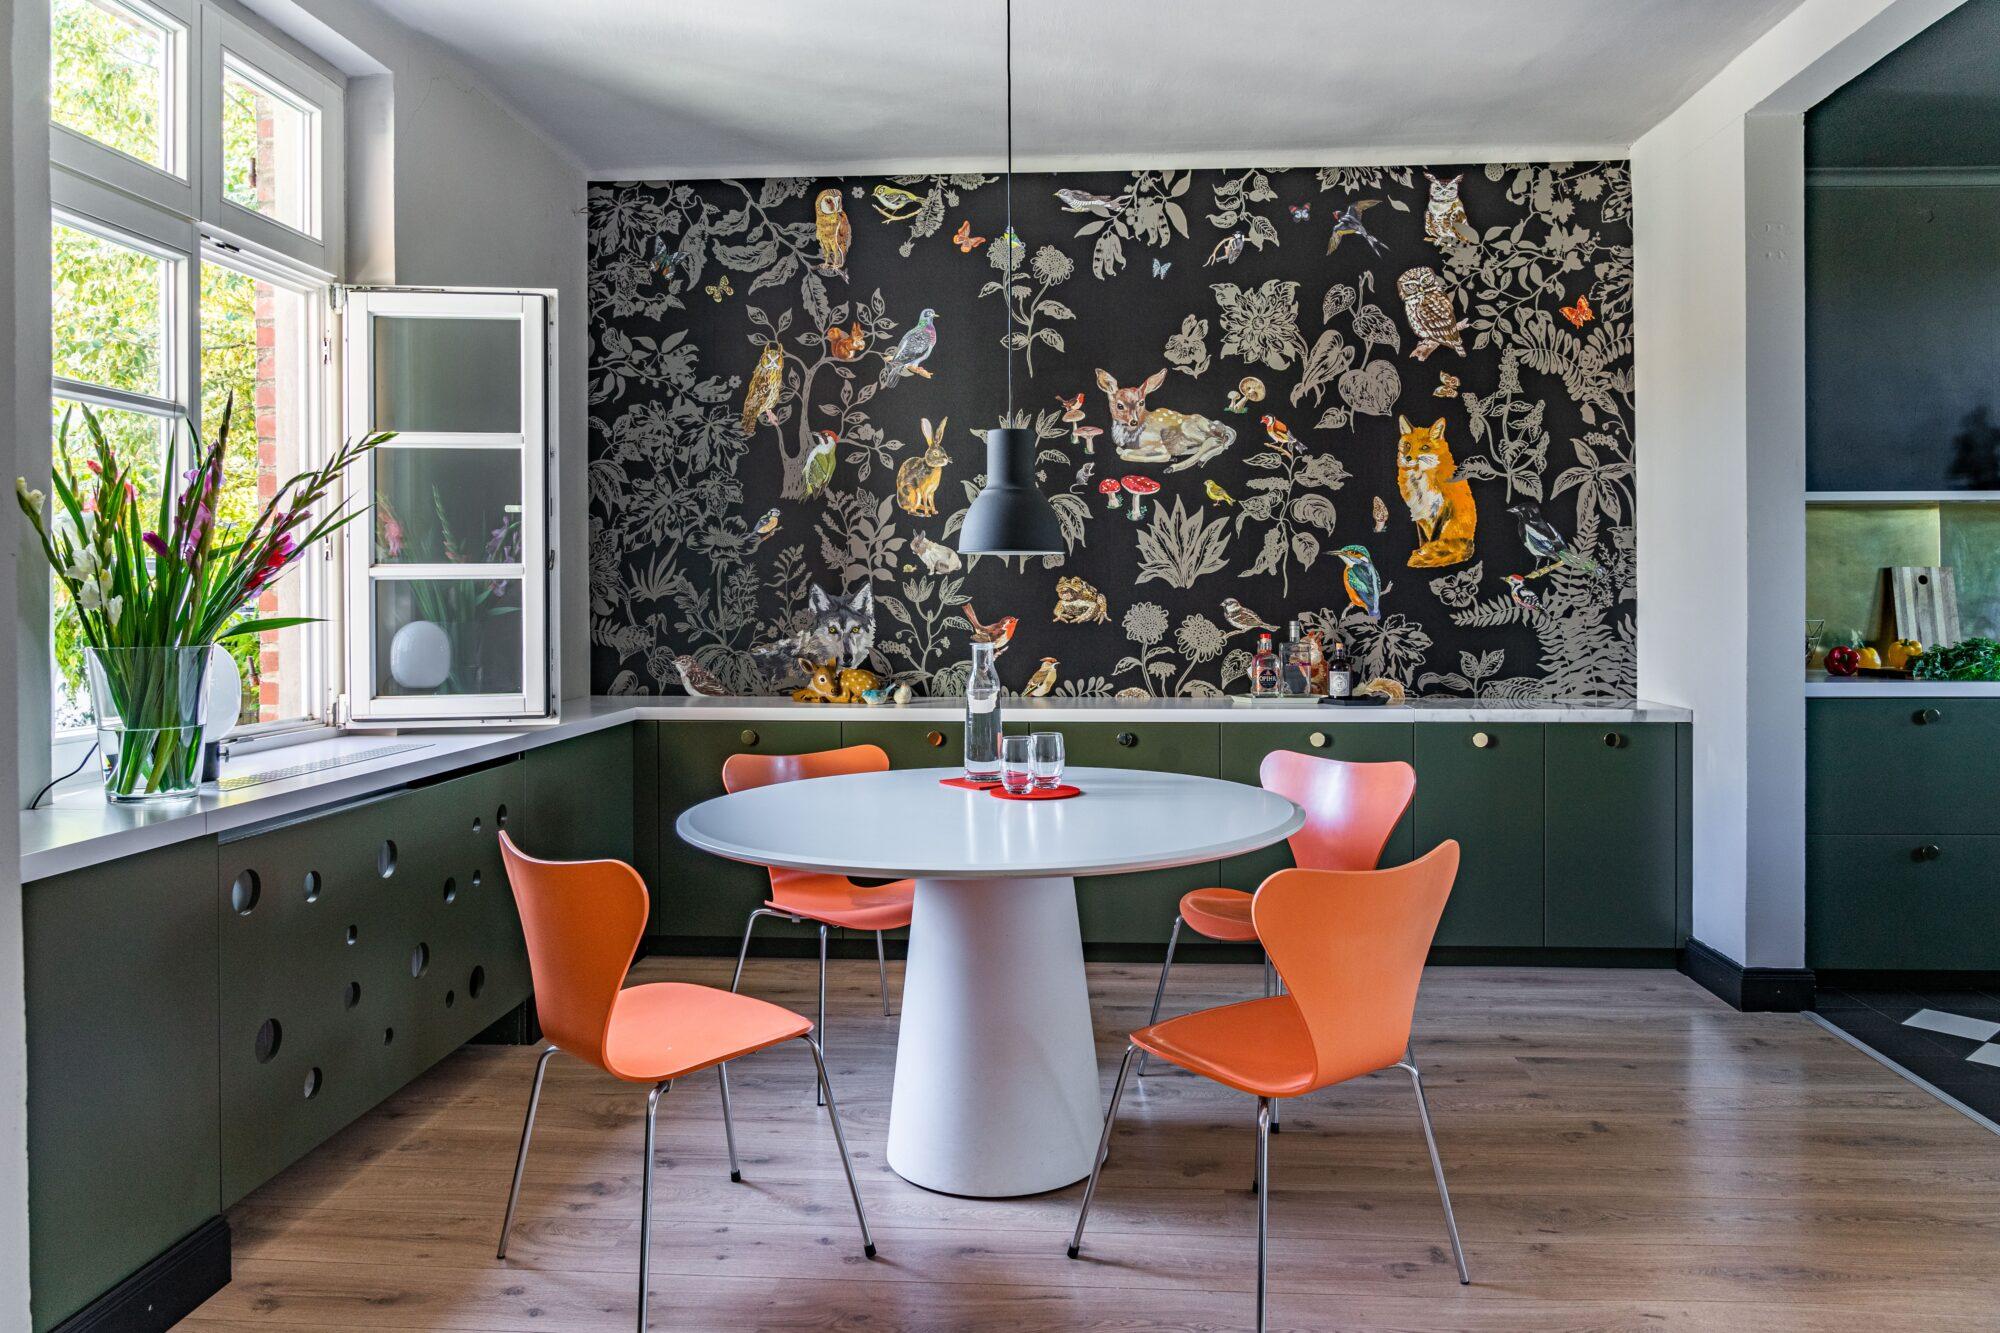 7 er stole – moderne og dansk design til spisestuen